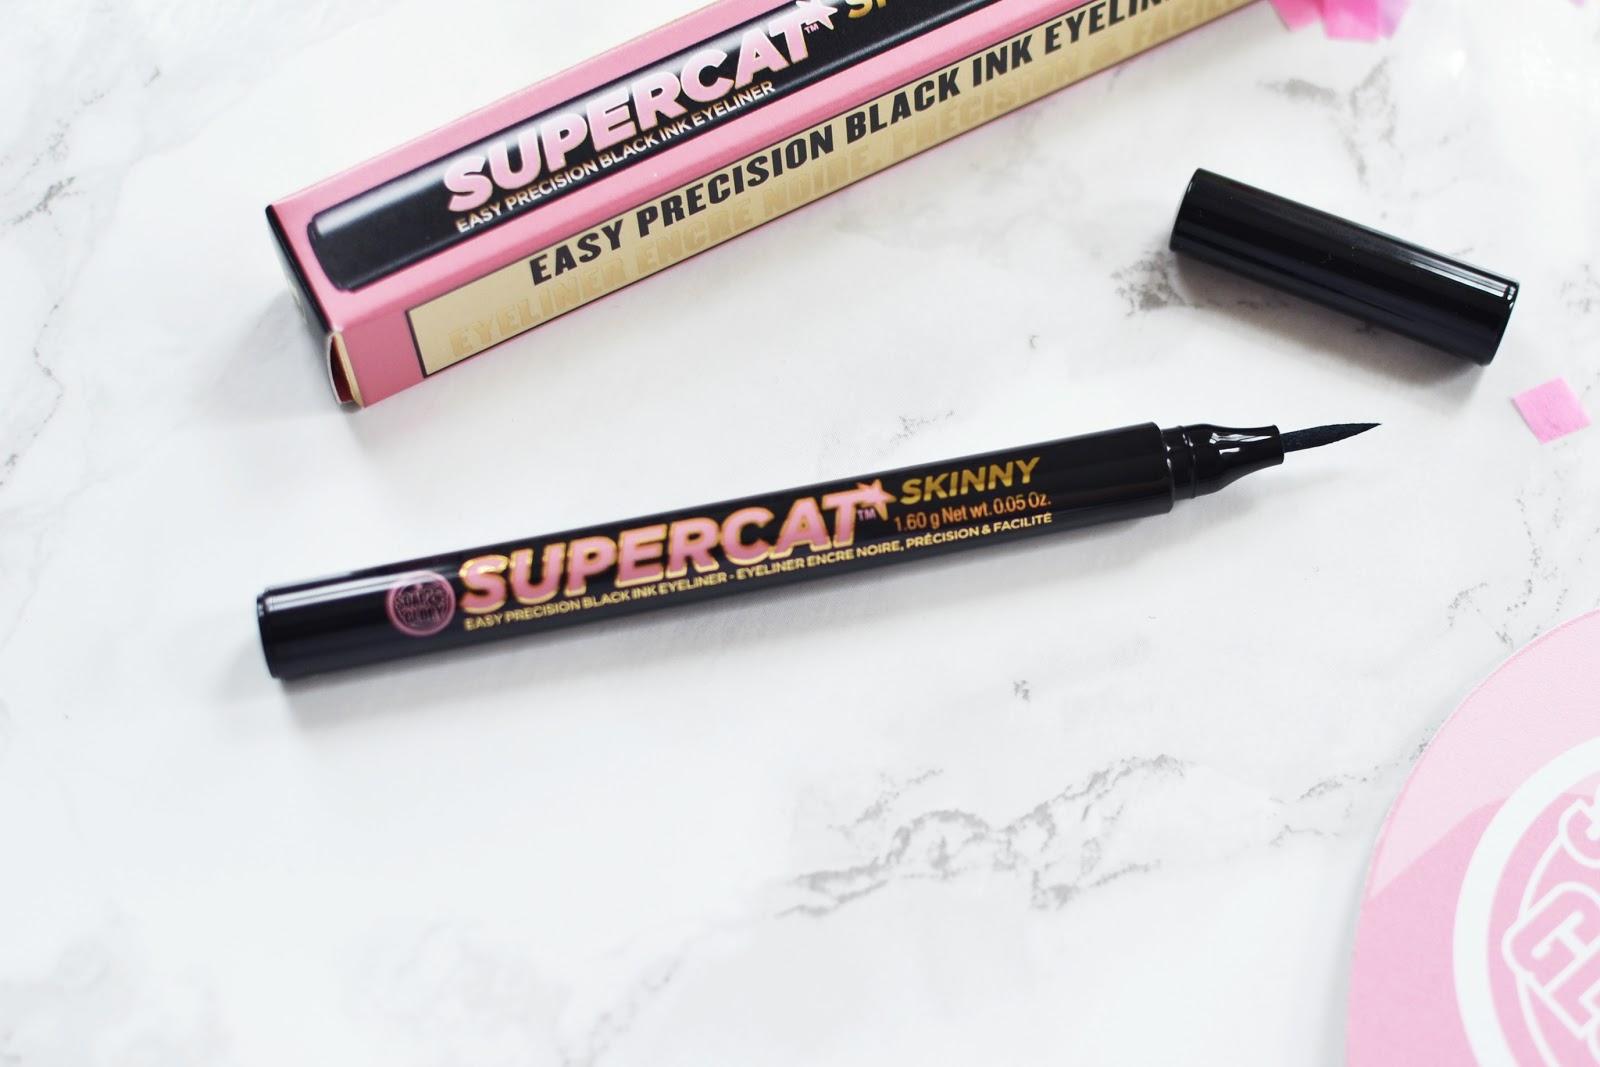 Soap & Glory's Supercat Skinny Liquid Eyeliner